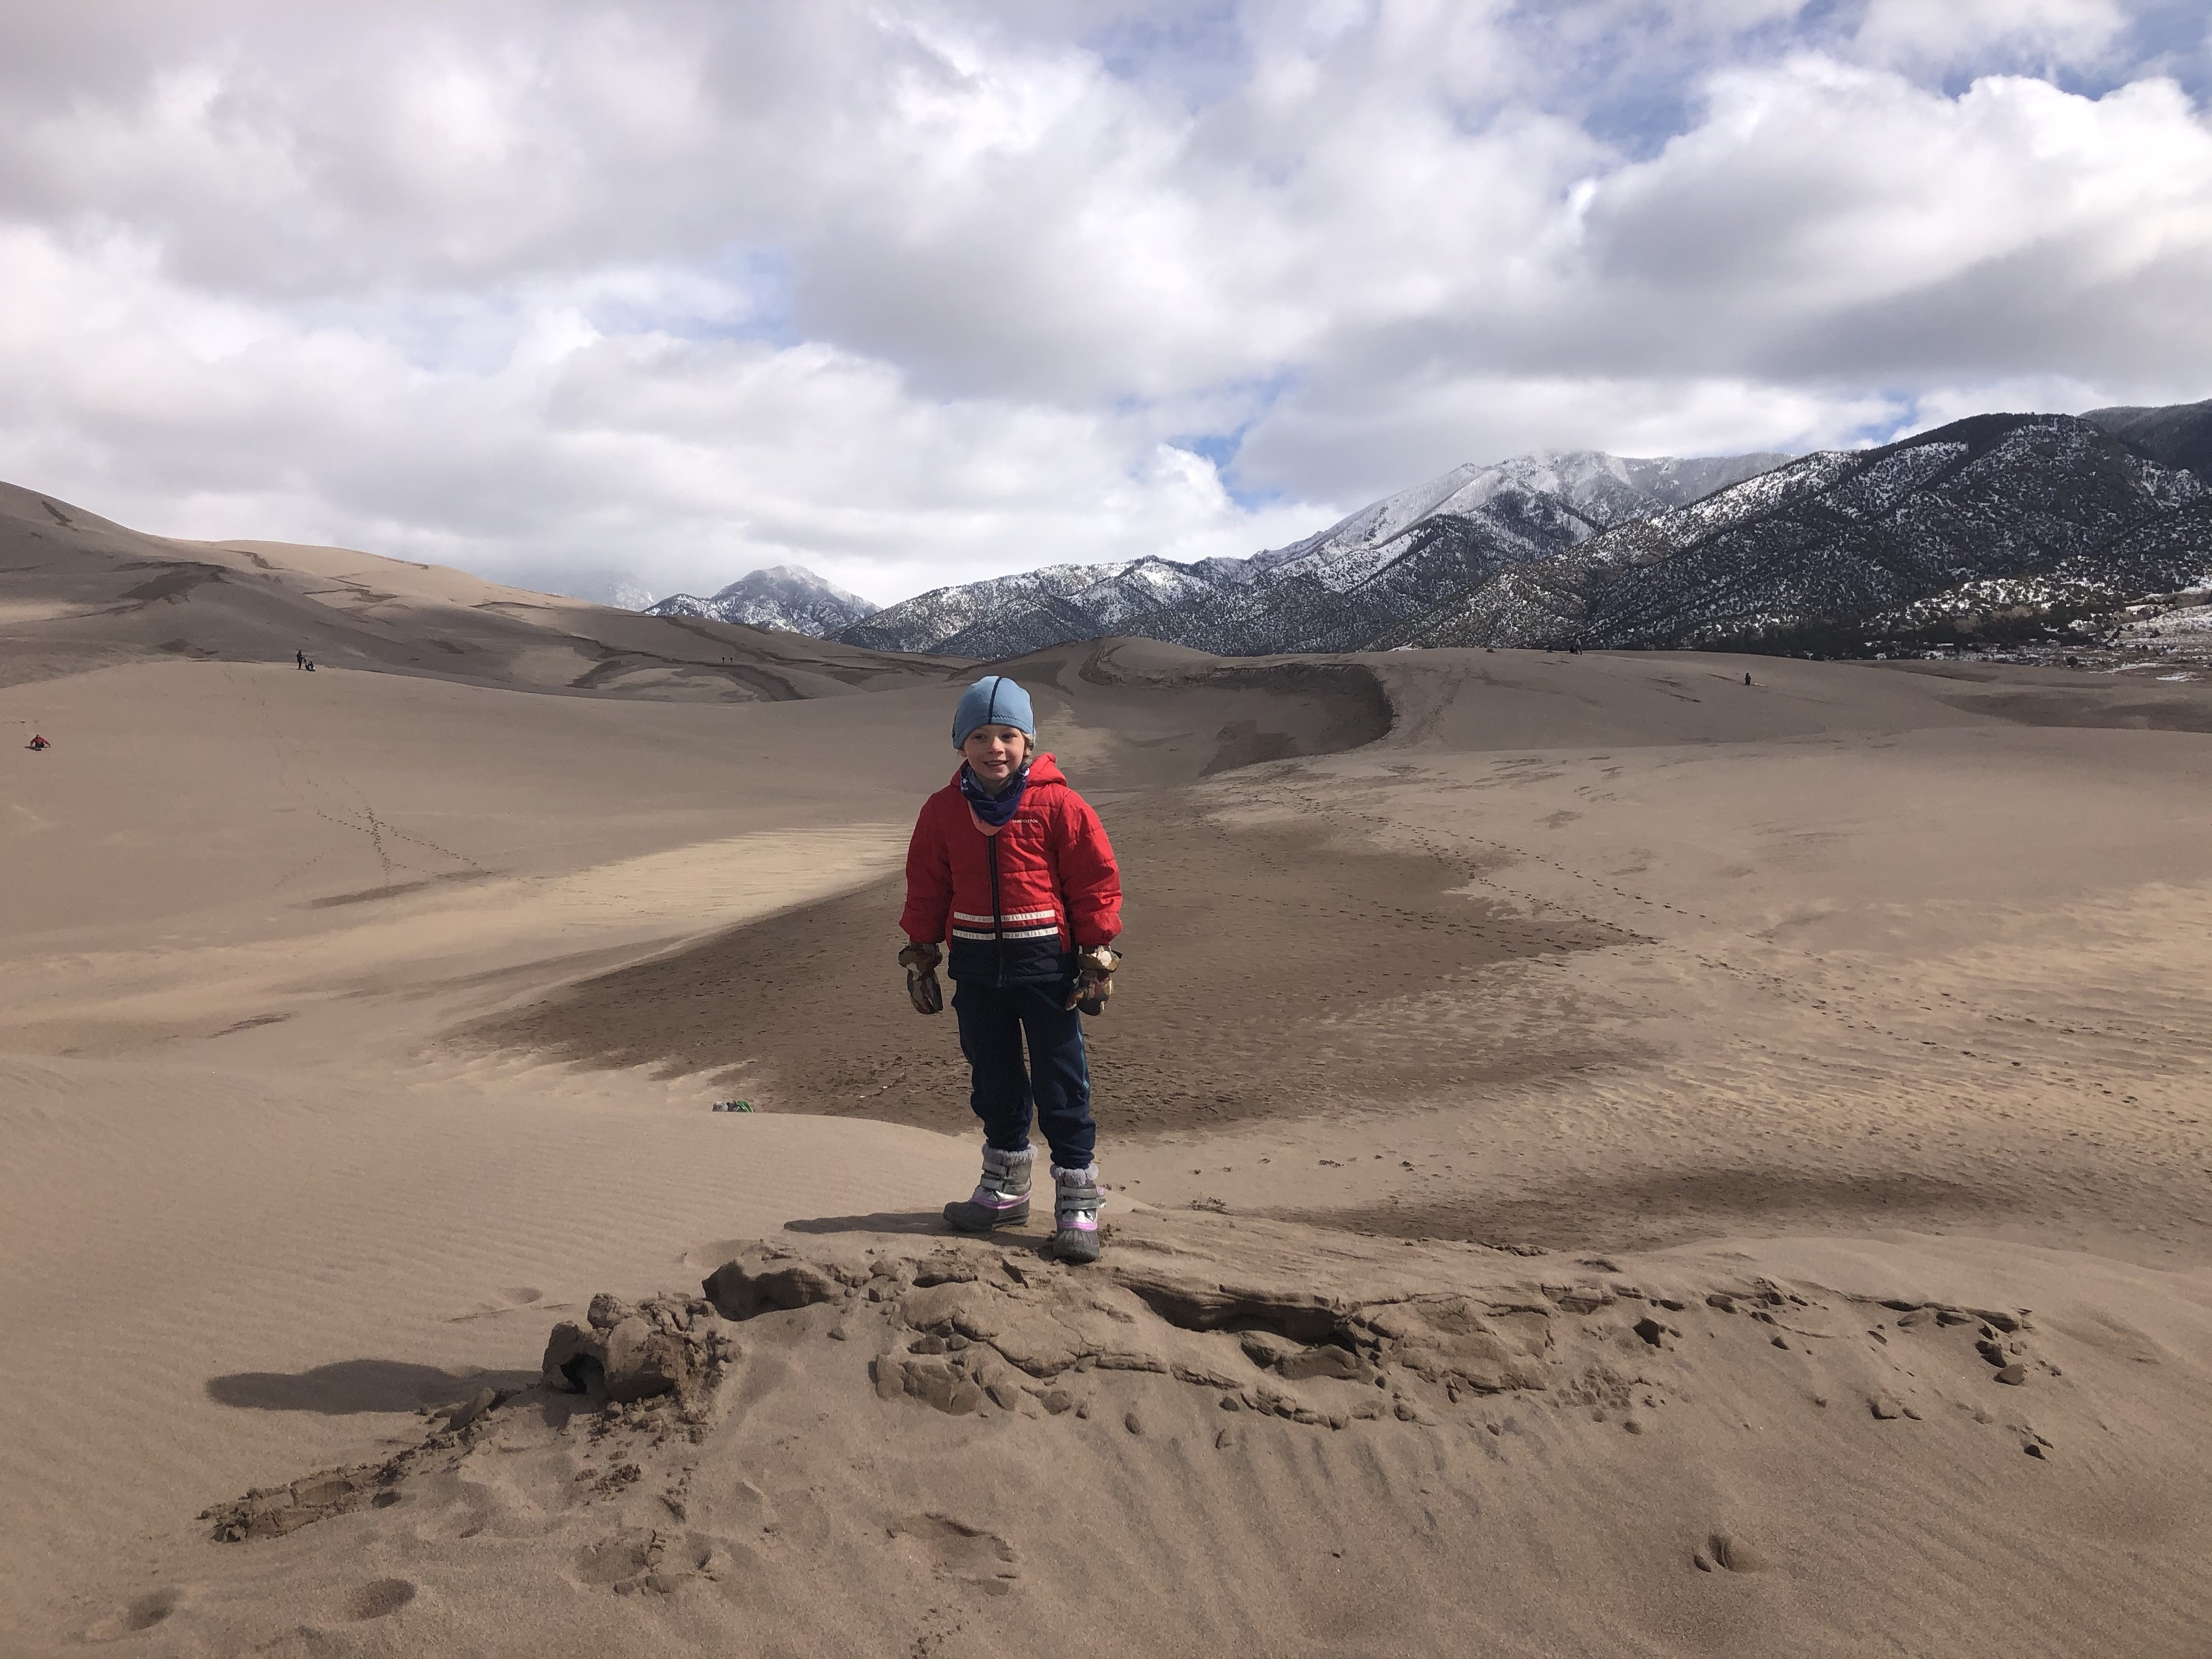 JPD - Sand Dunes